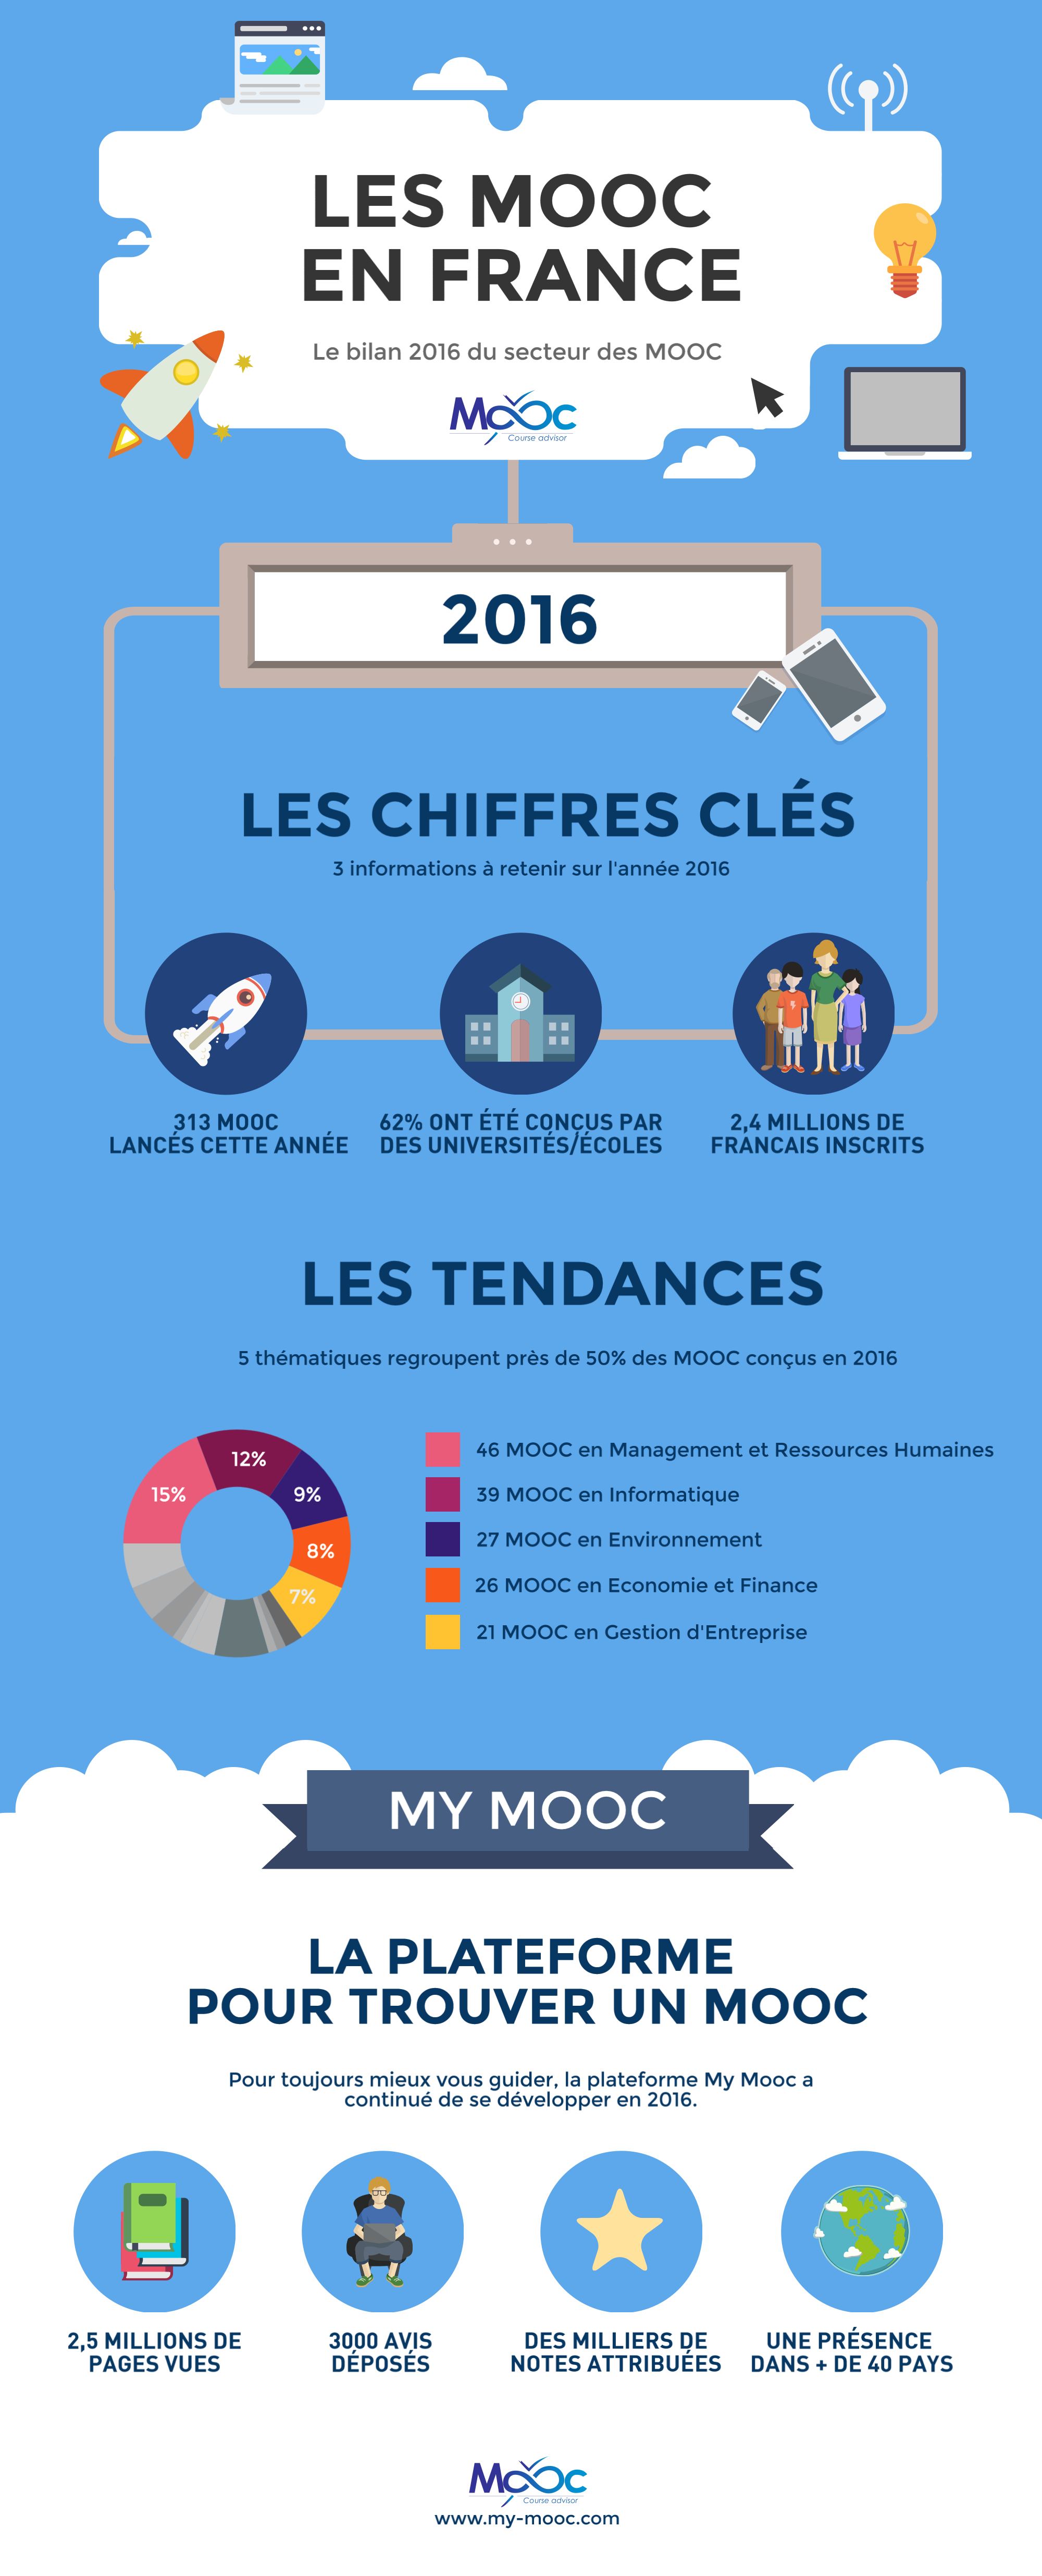 Bilan du secteur MOOC français en 2016